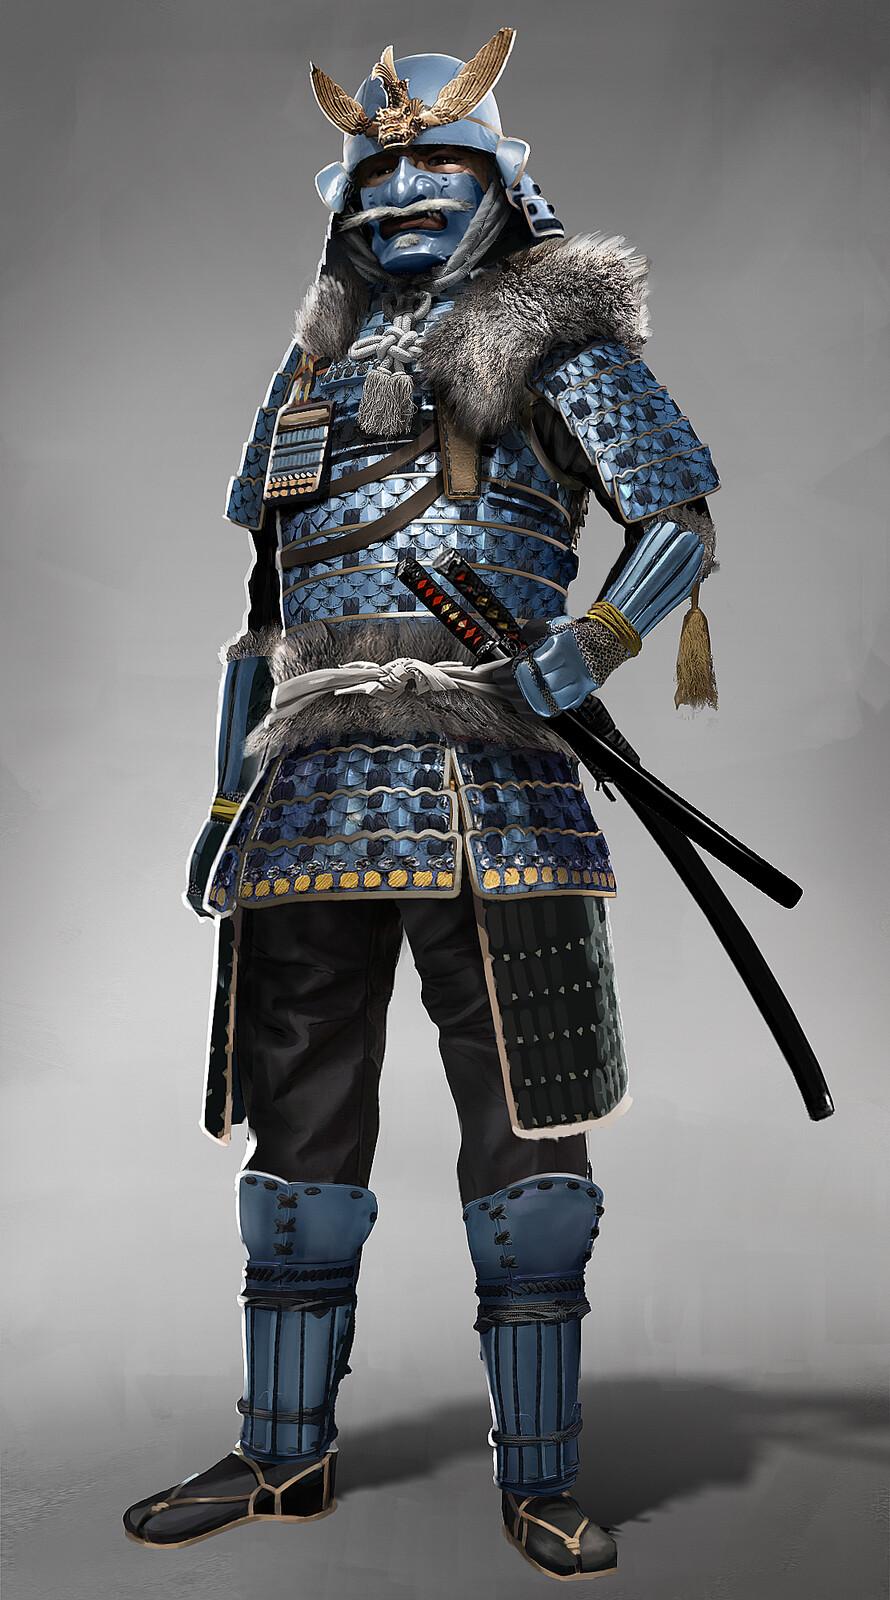 Winter Samurai Character Design